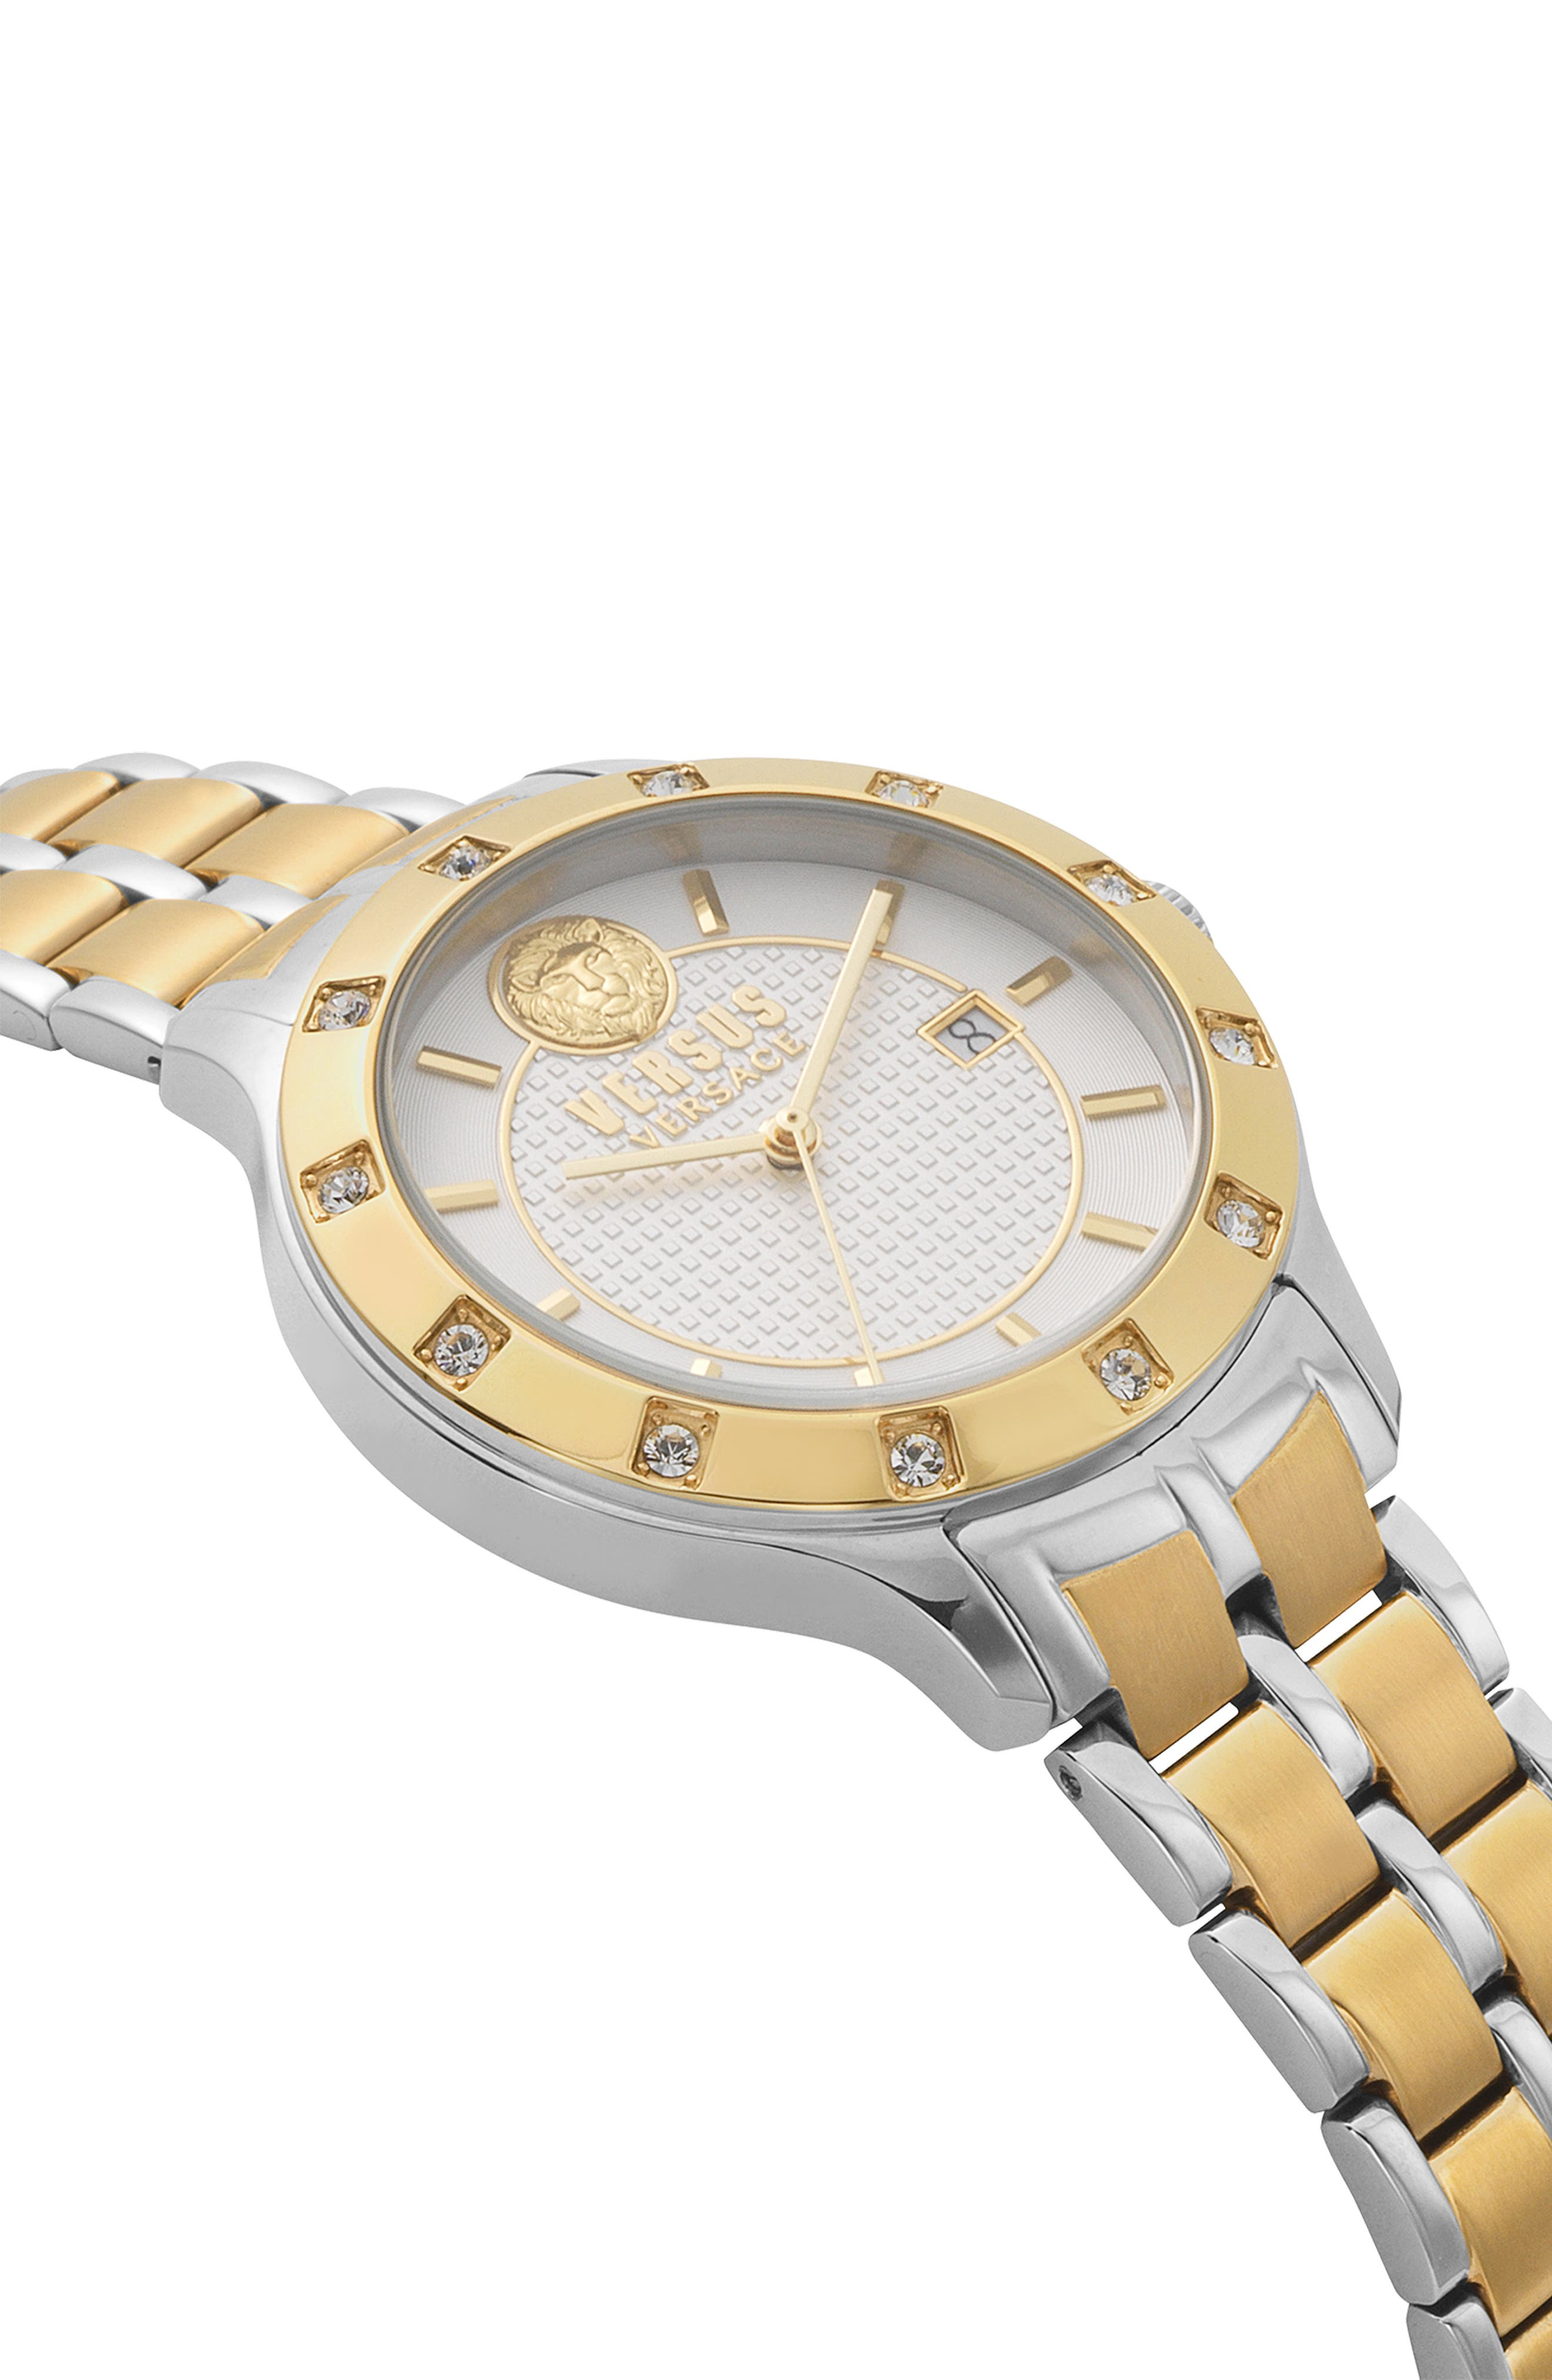 VERSUS VERSACE, Brackenfell Swarovski Bracelet Watch, 38mm, Alternate thumbnail 3, color, GOLD/ SILVER